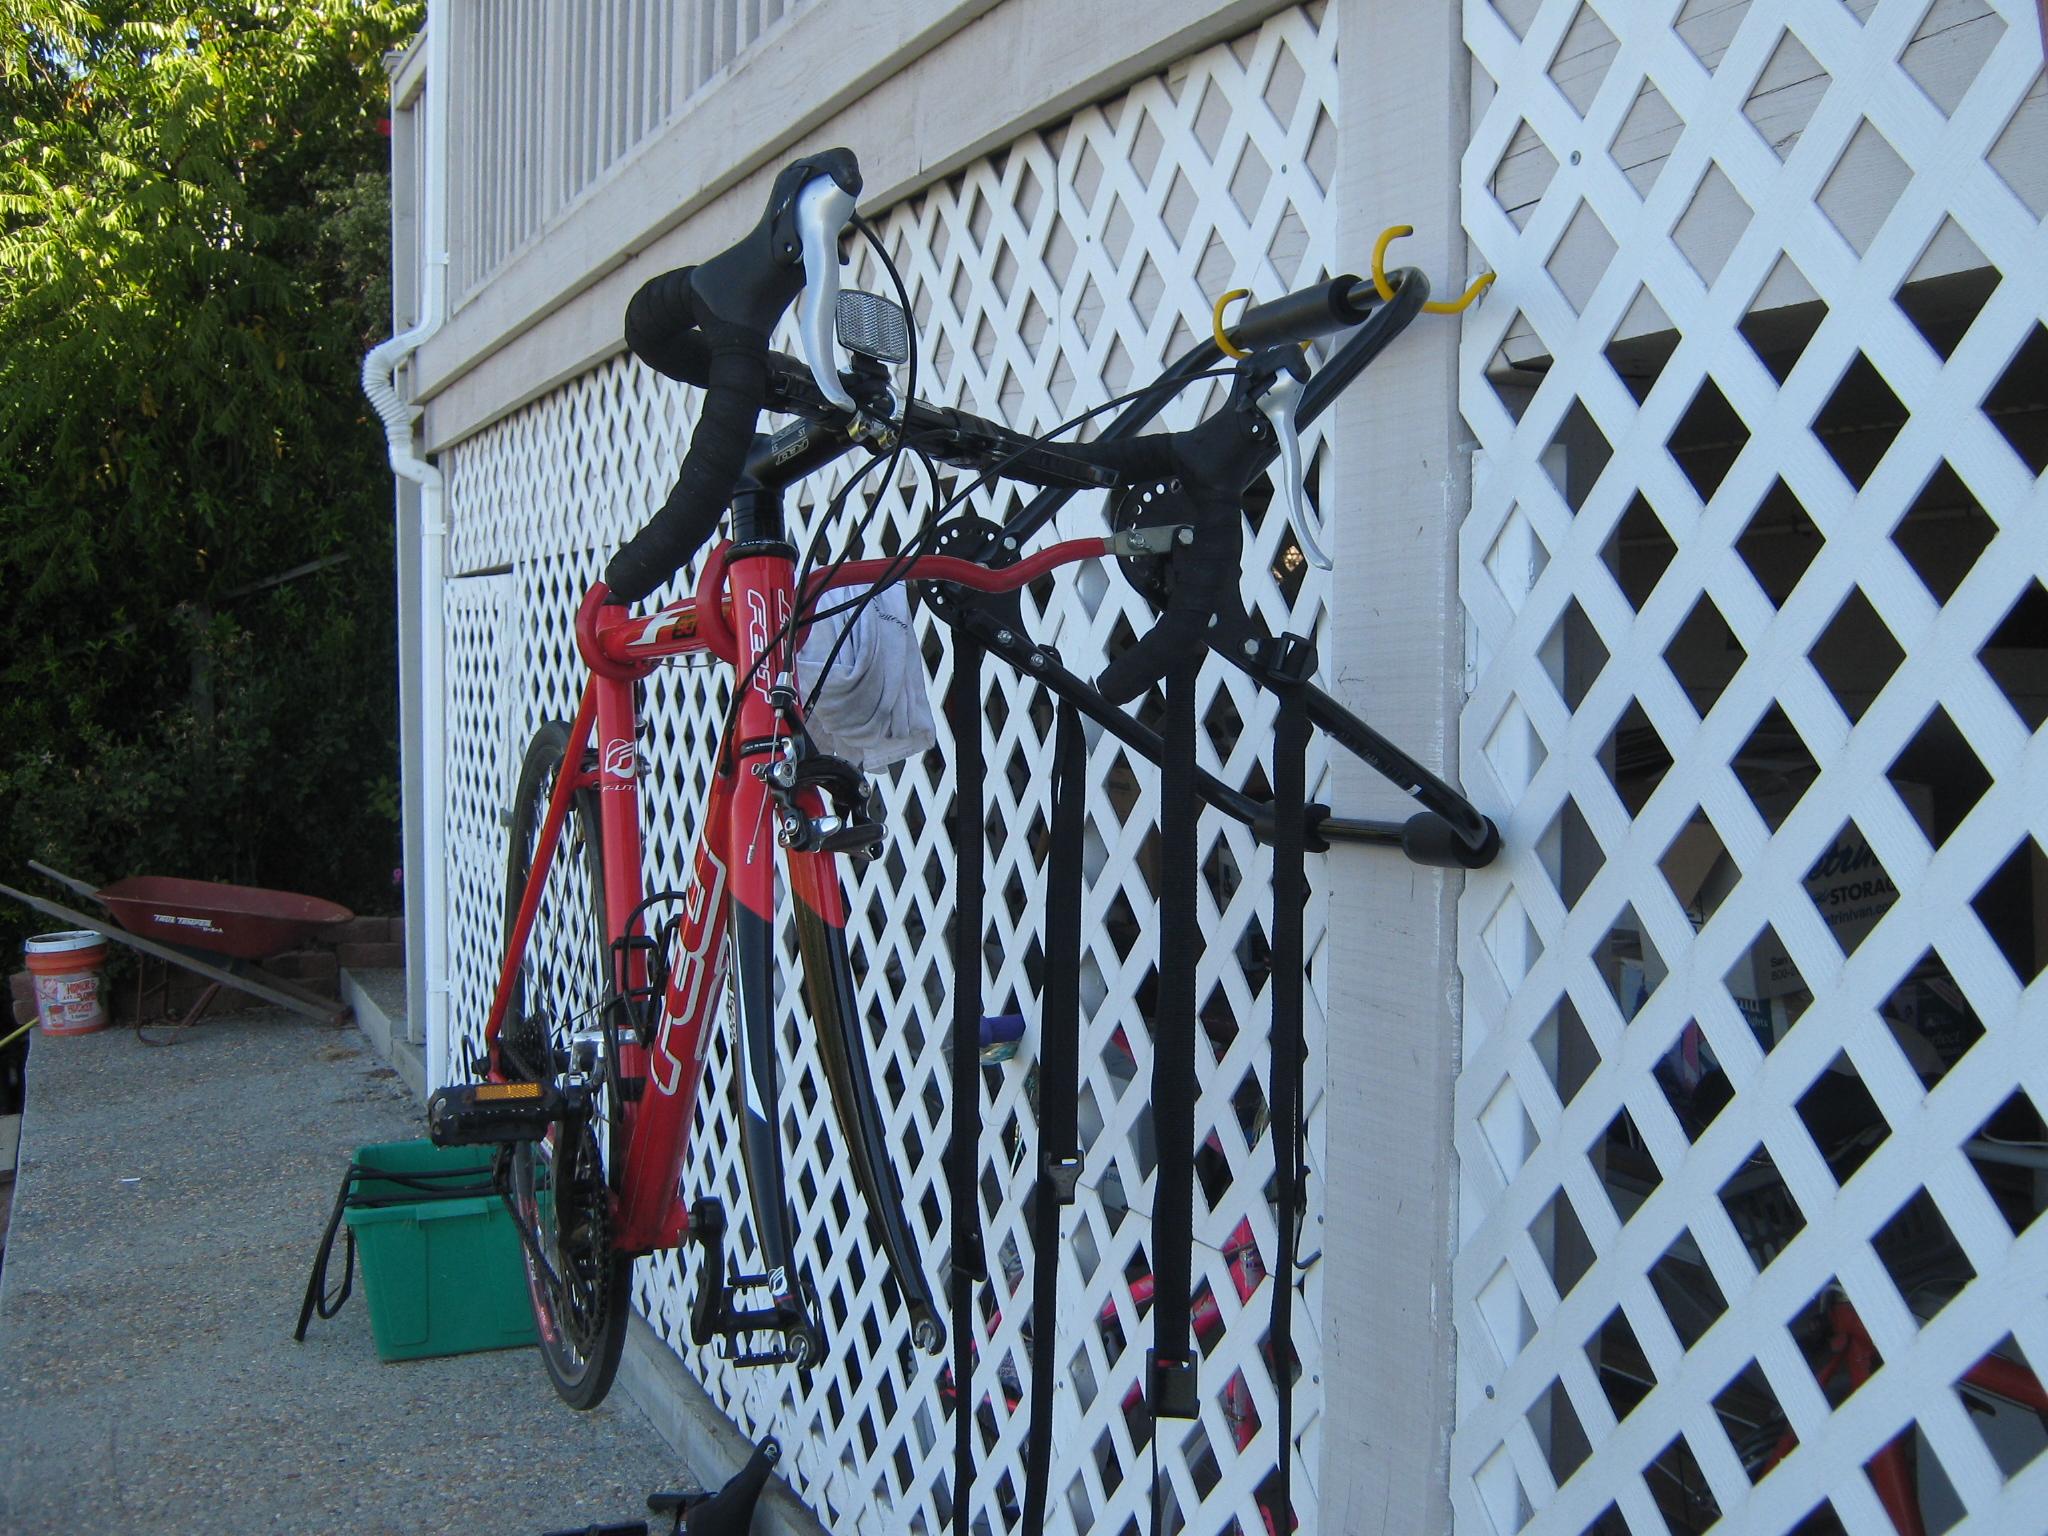 Bike Repair Stand - Ultra Cheap